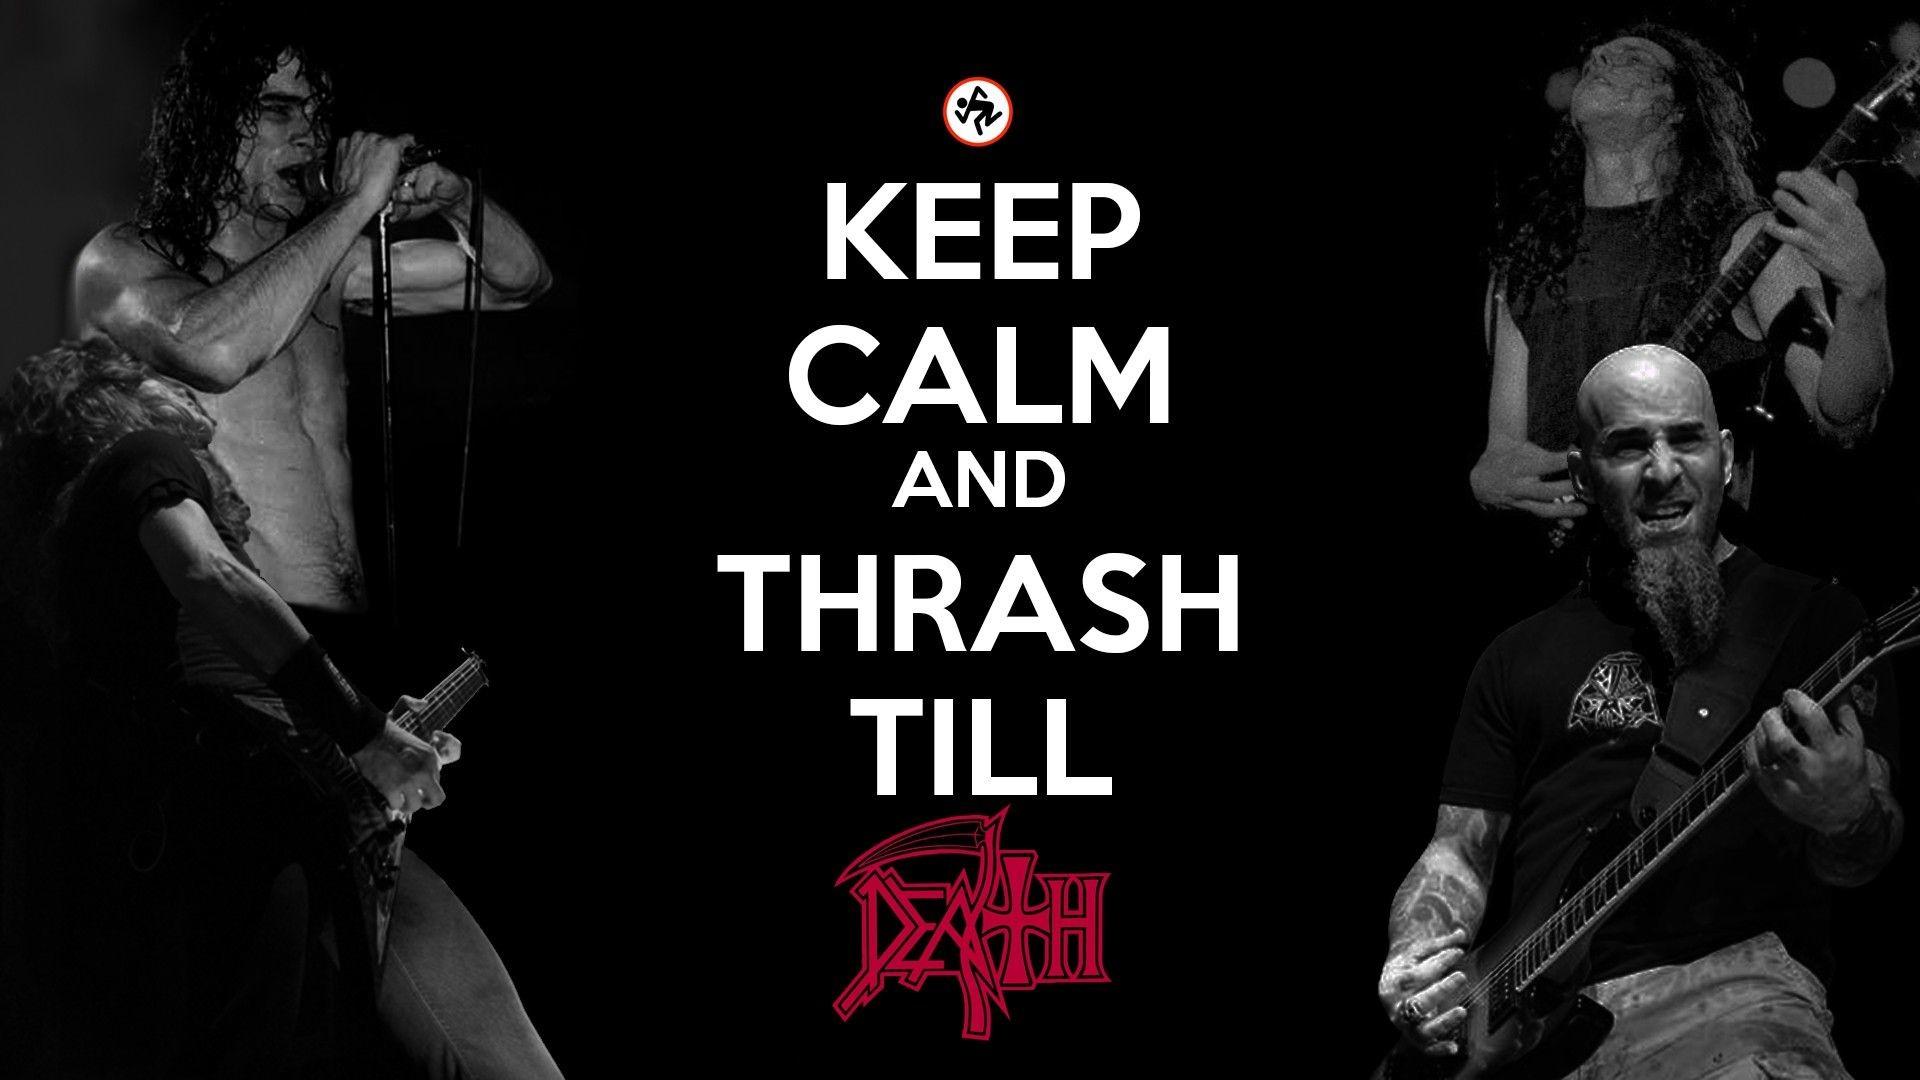 Res: 1920x1080, Thrash Metal Wallpaper | Megadeth Dave Mustaine Thrash Metal Big Four X  Wallpaper Www